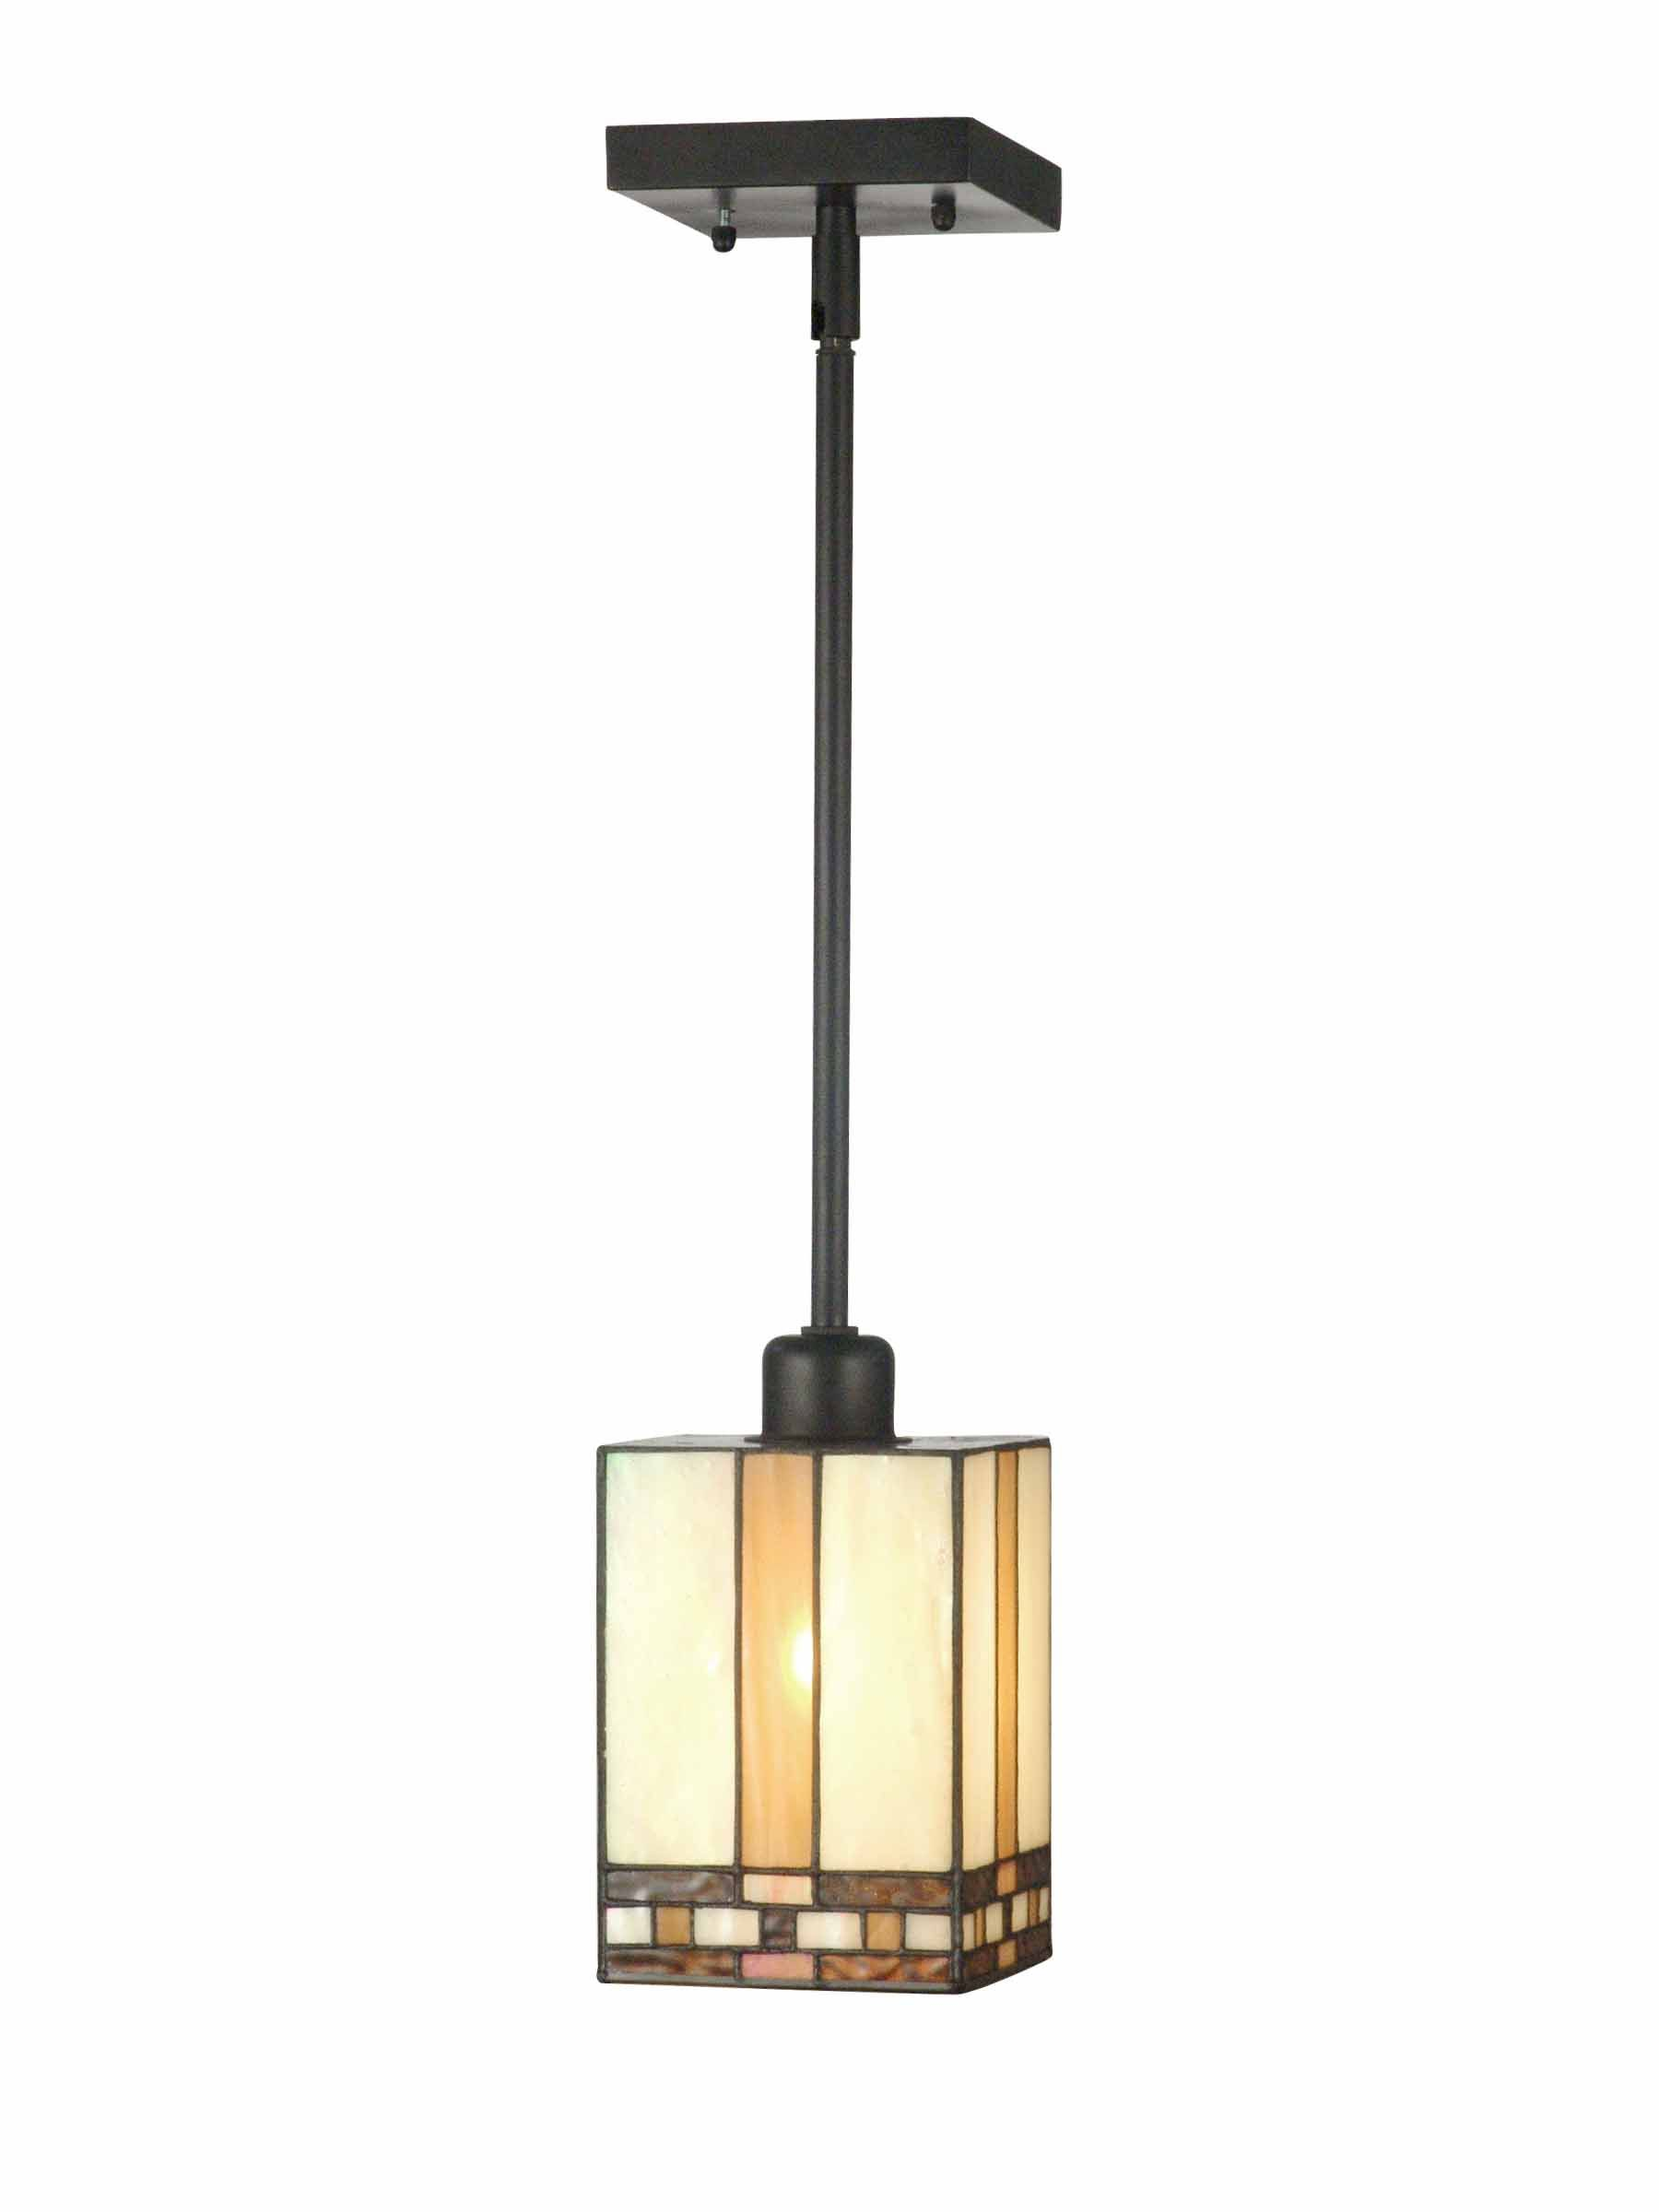 Springdale Chatfield Mission Tiffany Mini Pendant Beige Tan In 2021 Mini Pendant Ceiling Pendant Lights Craftsman Lighting